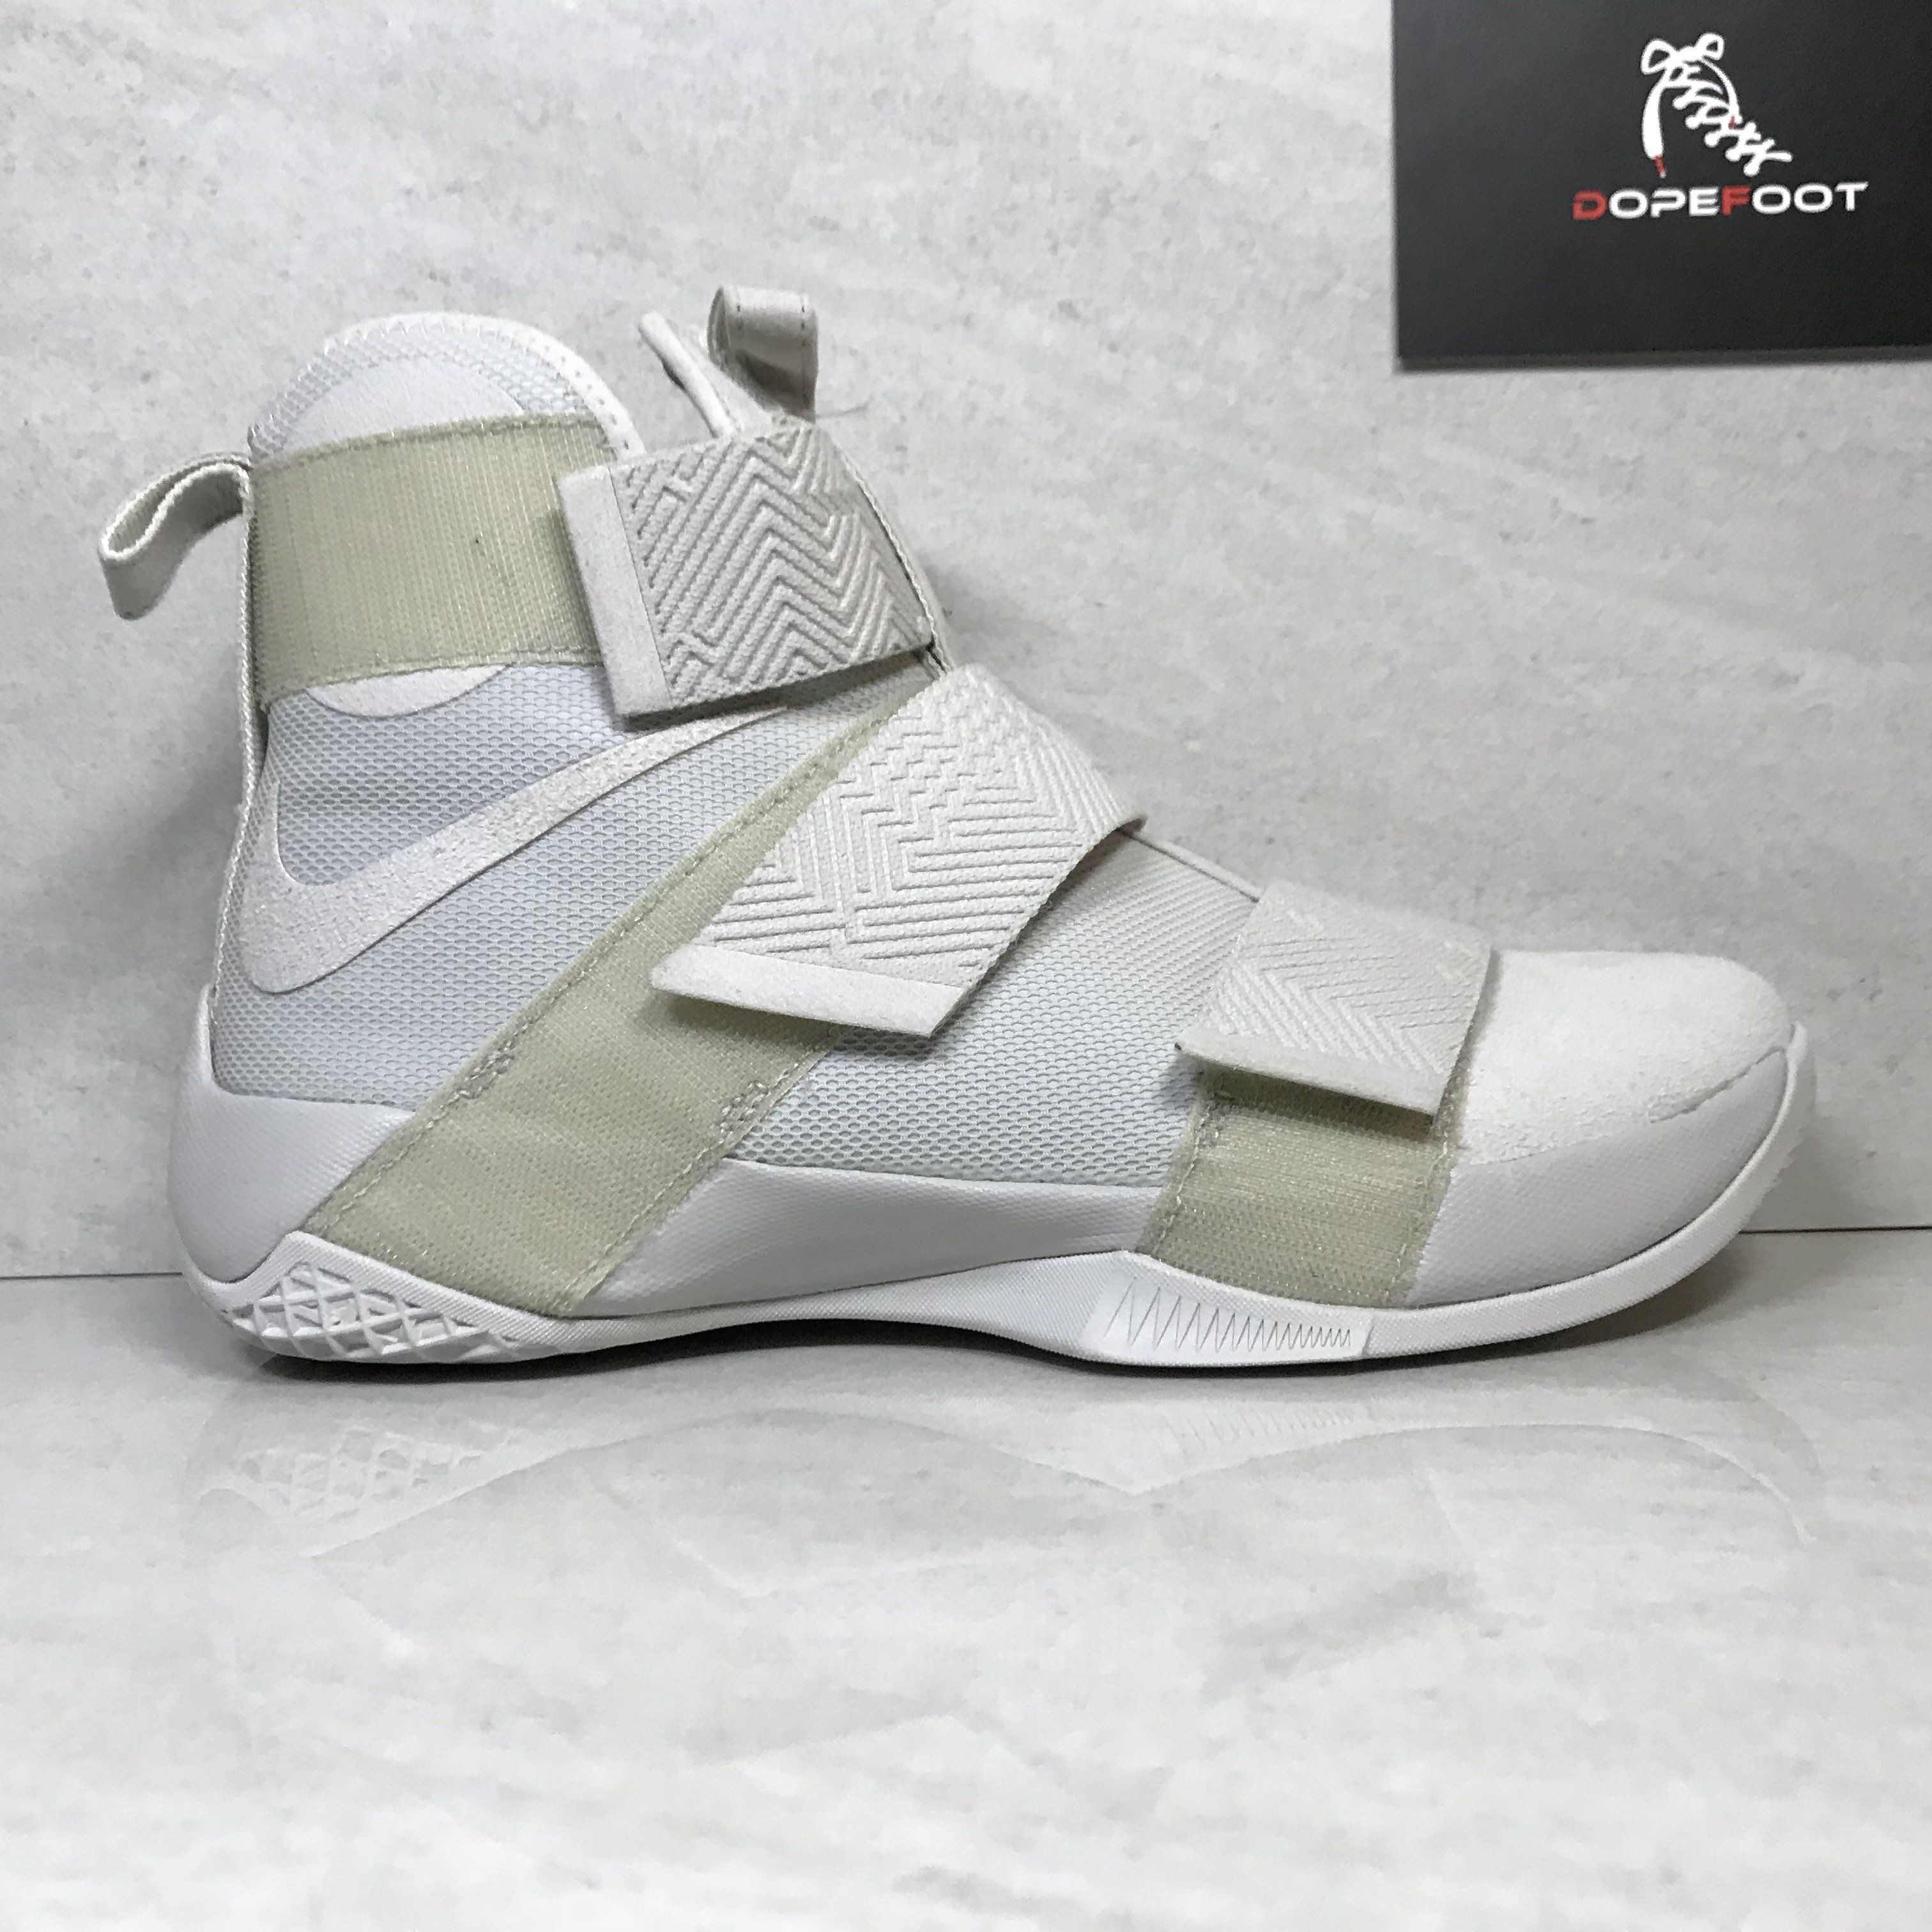 e4e1b774fbe DS Nike Lebron Soldier 10 X SFG LUX Light Bone Size 9 Size 9.5 Size 10